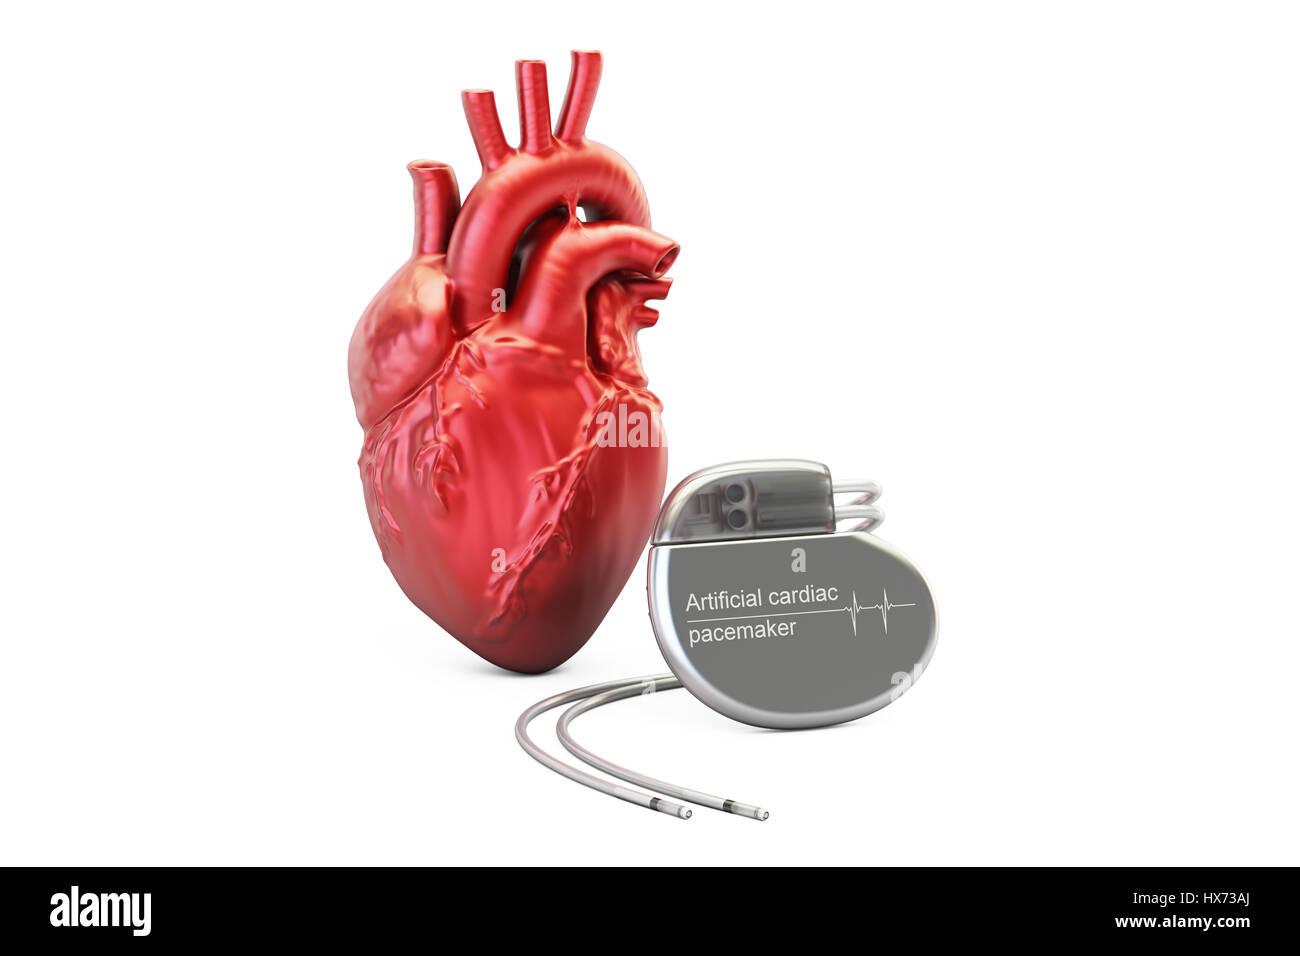 Artificial Cardiac Pacemaker Stock Photos Artificial Cardiac